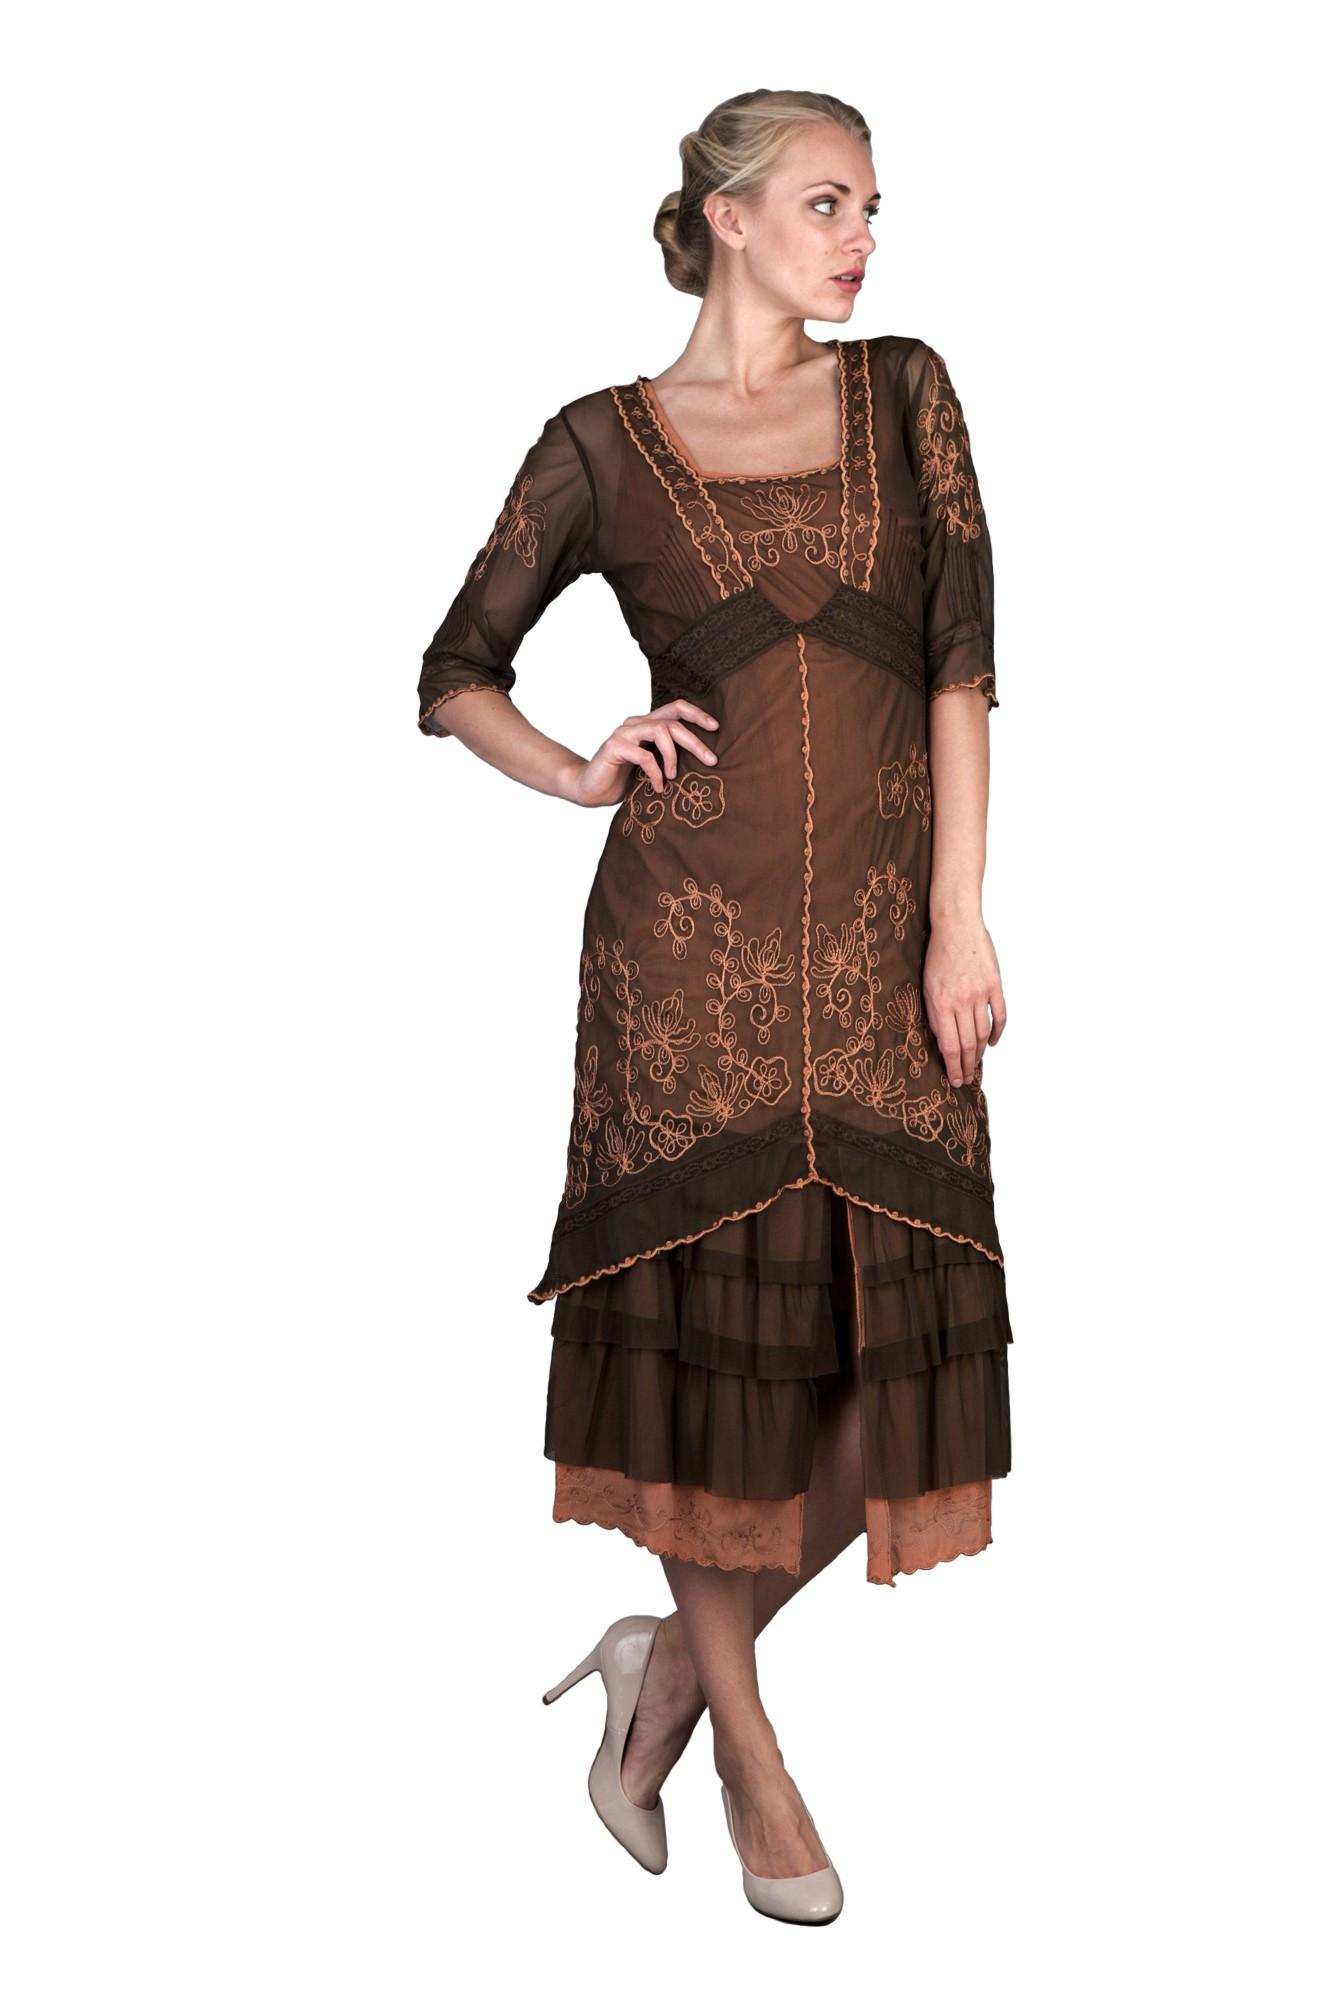 titanic tea party dress in terracottanataya